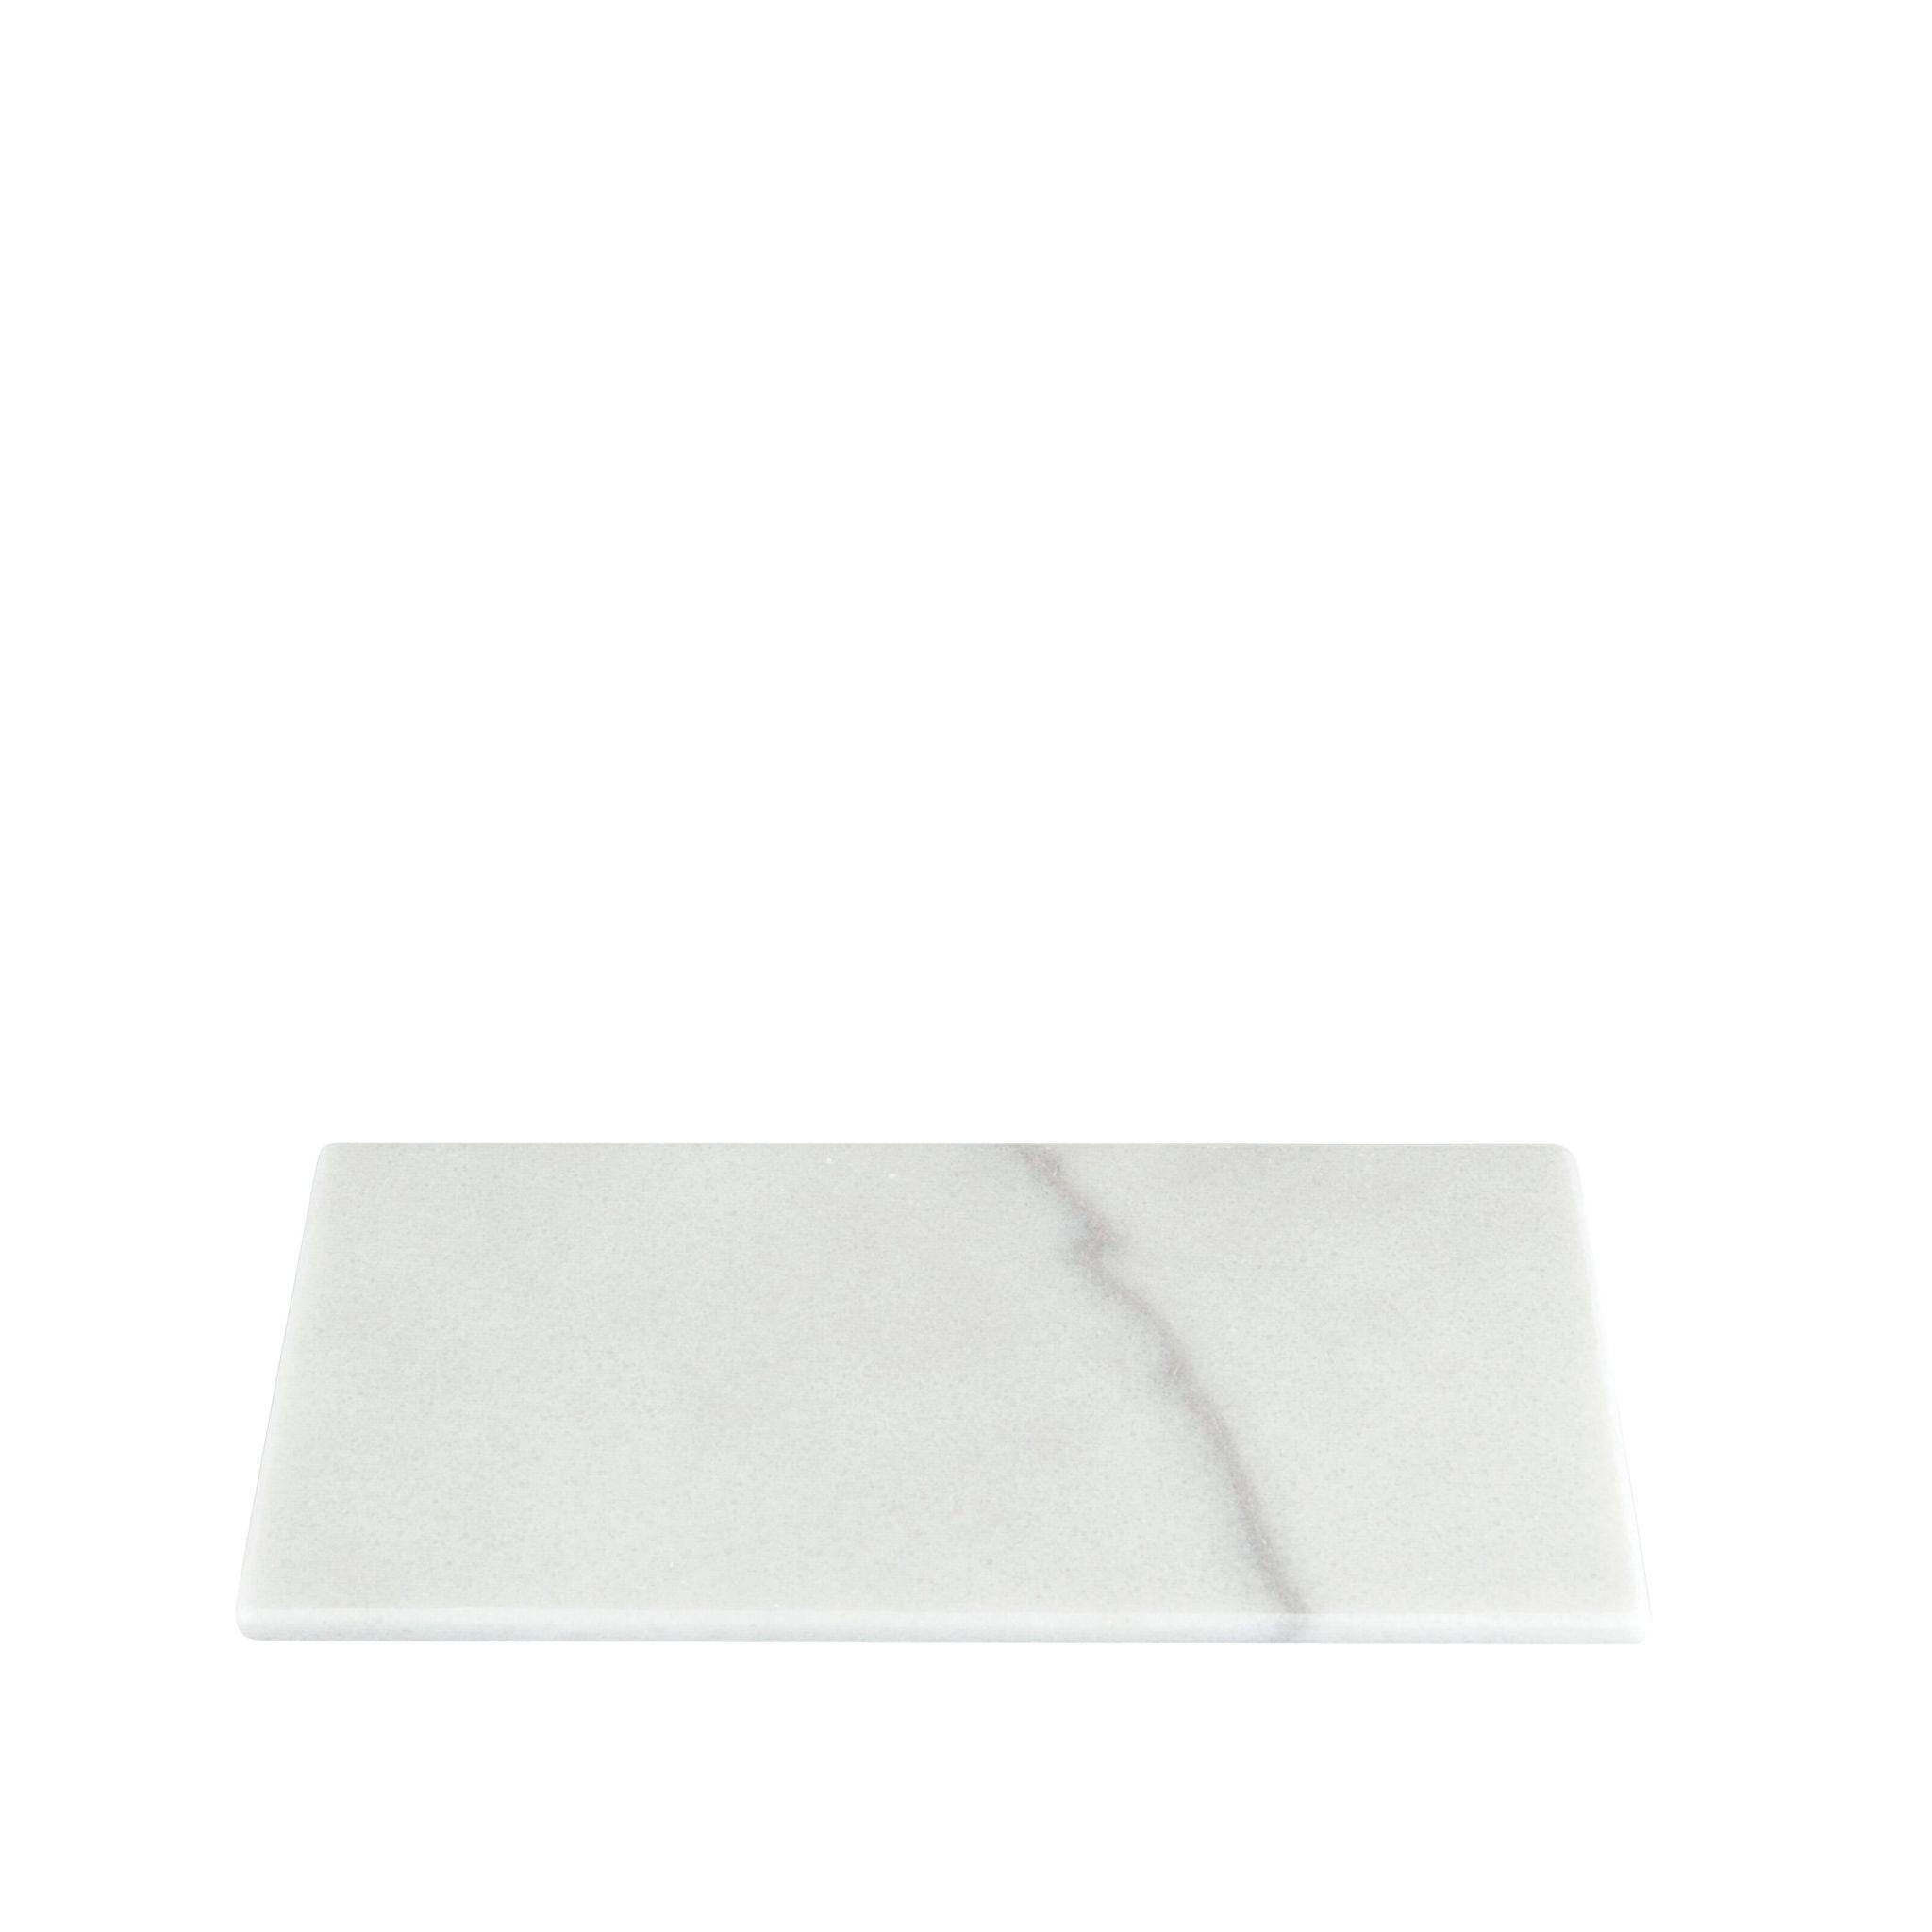 Stoned Stoned Serveerplank wit marmer W015